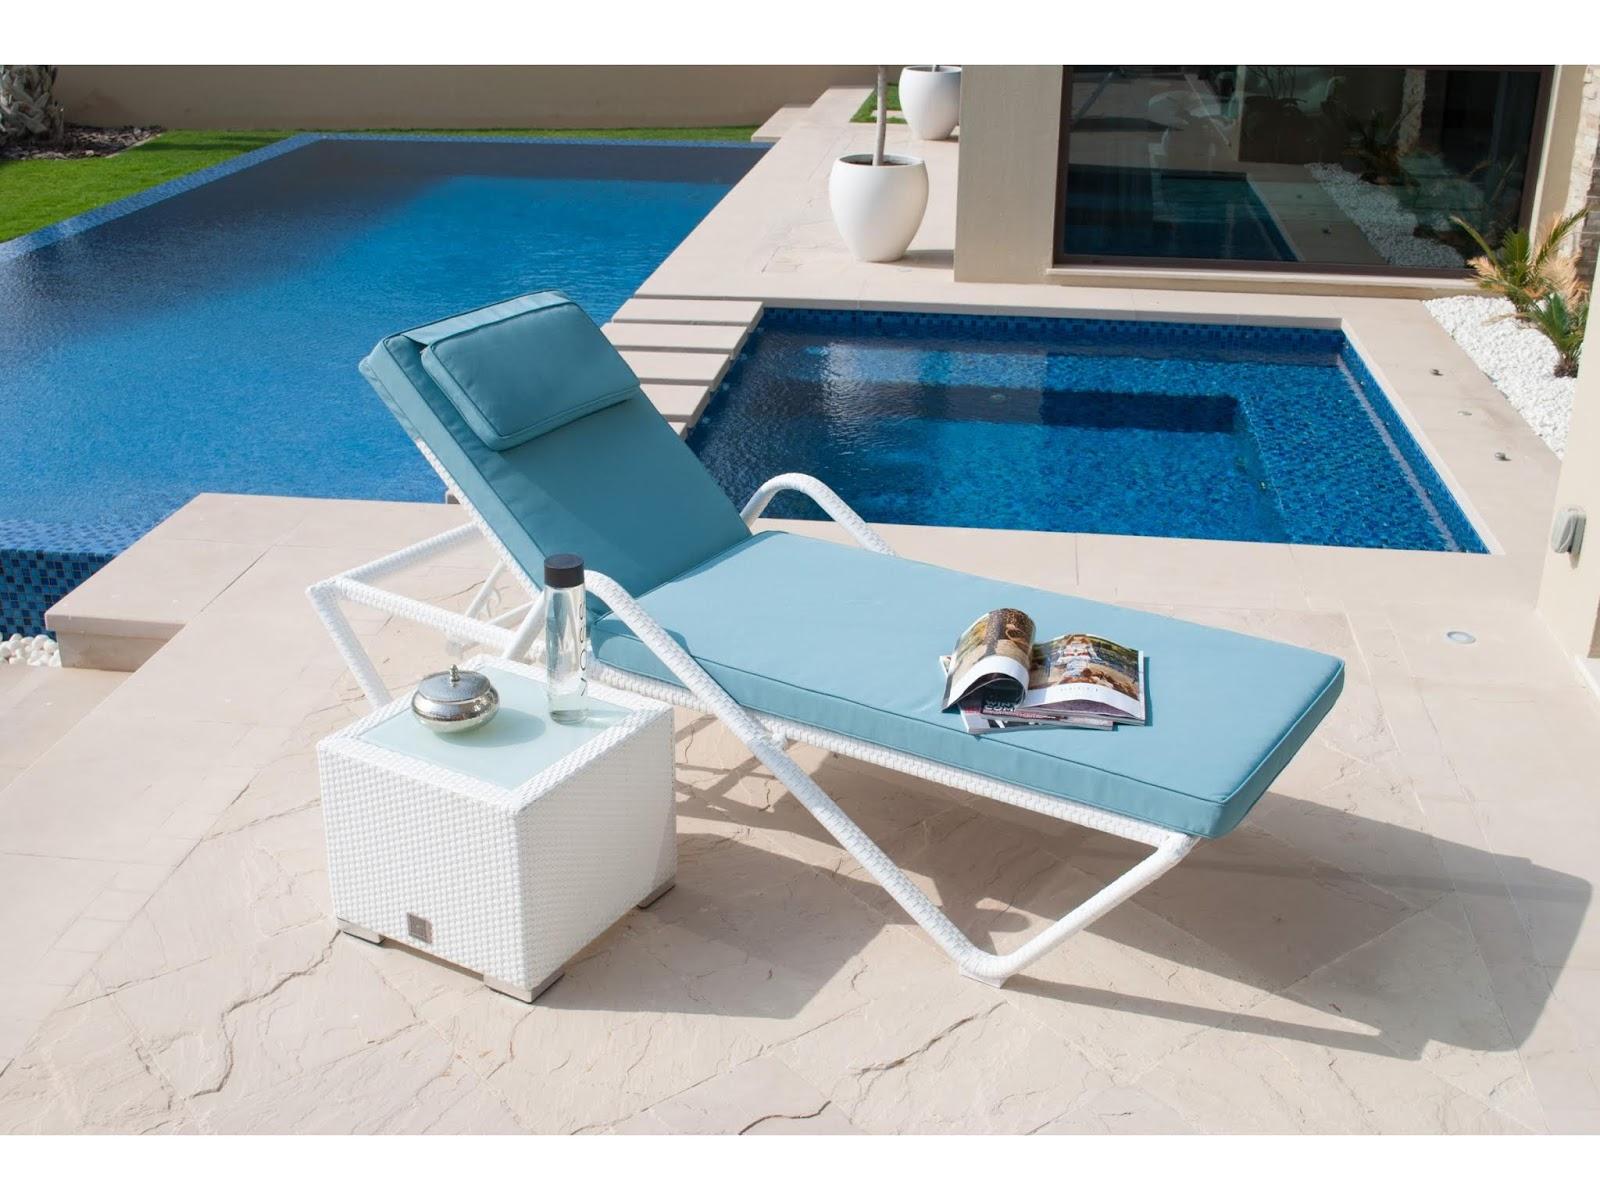 Miraculous Garden Furniture Dubai Outdoor Sofa Sets Guide To Buy Interior Design Ideas Clesiryabchikinfo